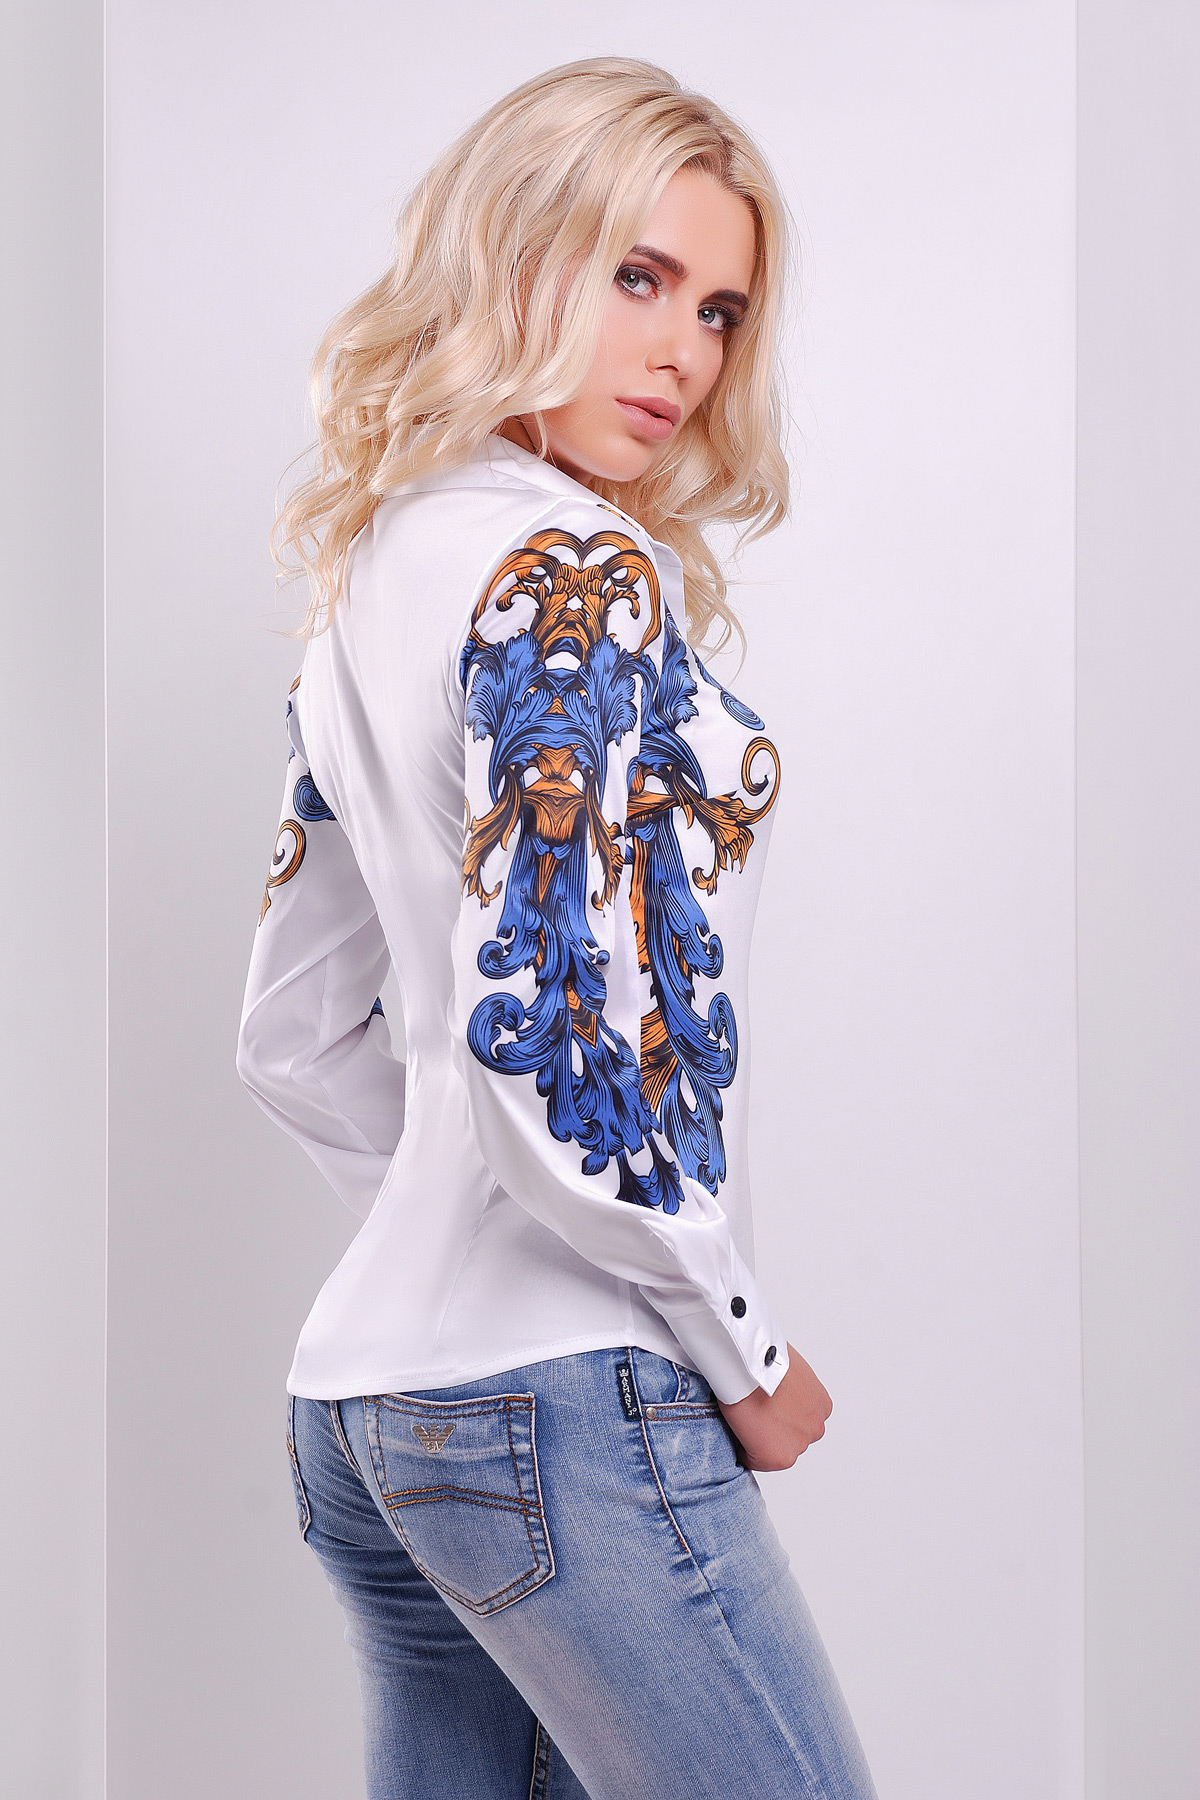 Узор сине-оранжевый блуза Ларси-3 д/р